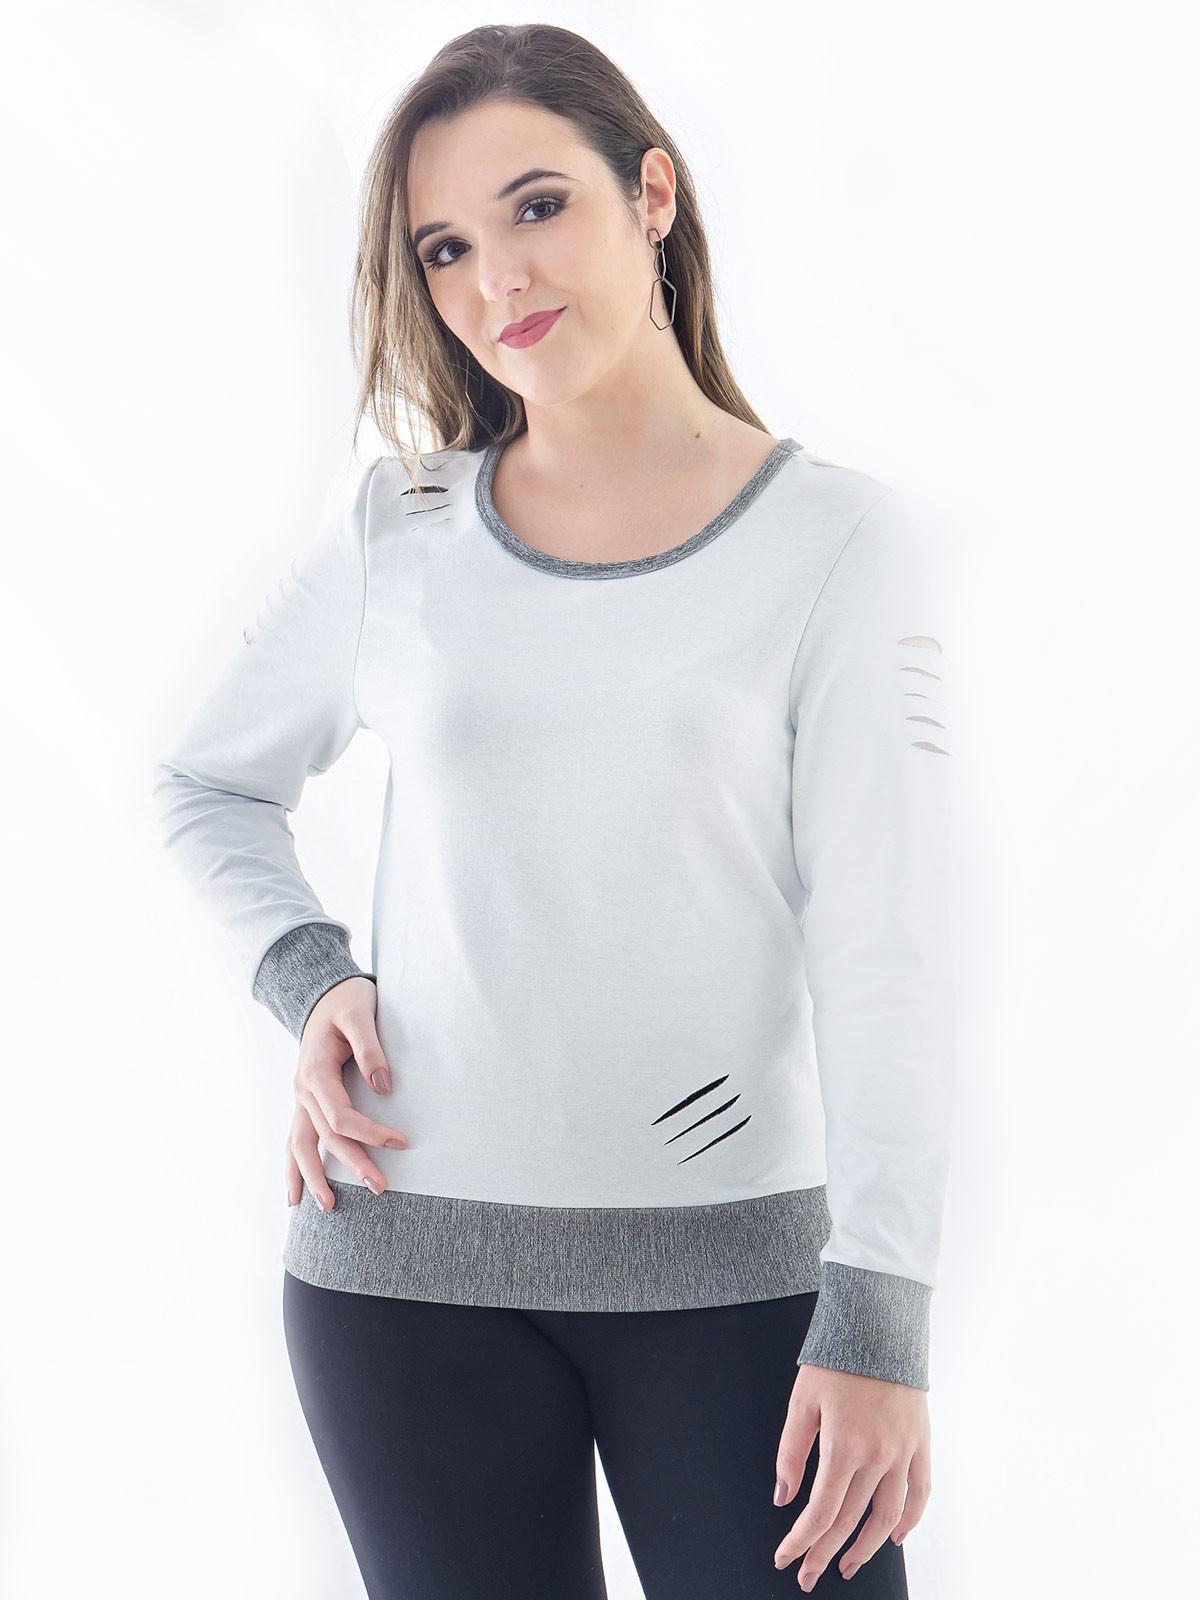 Blusa Moletom Feminina Corte Laser Gola Careca Branca